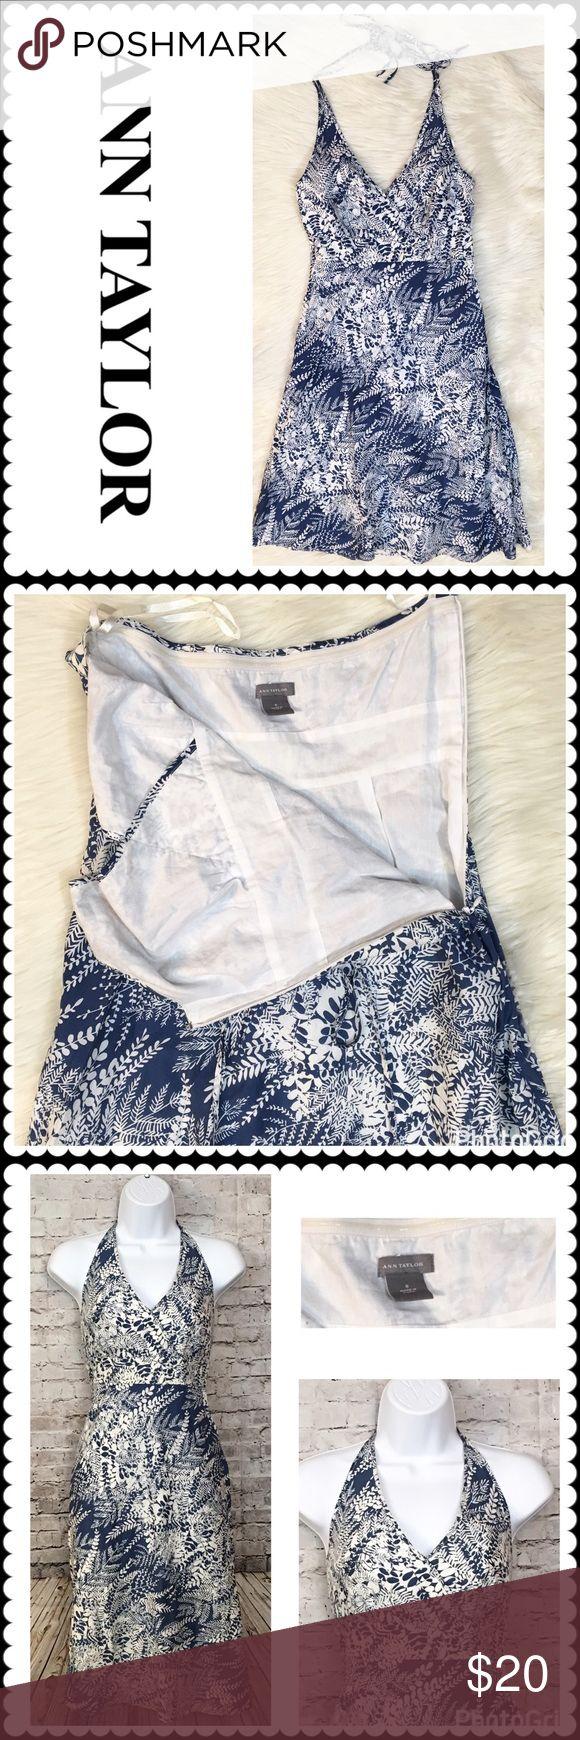 ANN TAYLOR Blue/White Print Halter Sundress Sz 0 Beautiful Blue and white print sundress by Ann Taylor. Halter style. Ties around neck. Hidden side zipper for entry. Fully lined. Size 0 Ann Taylor Dresses Midi